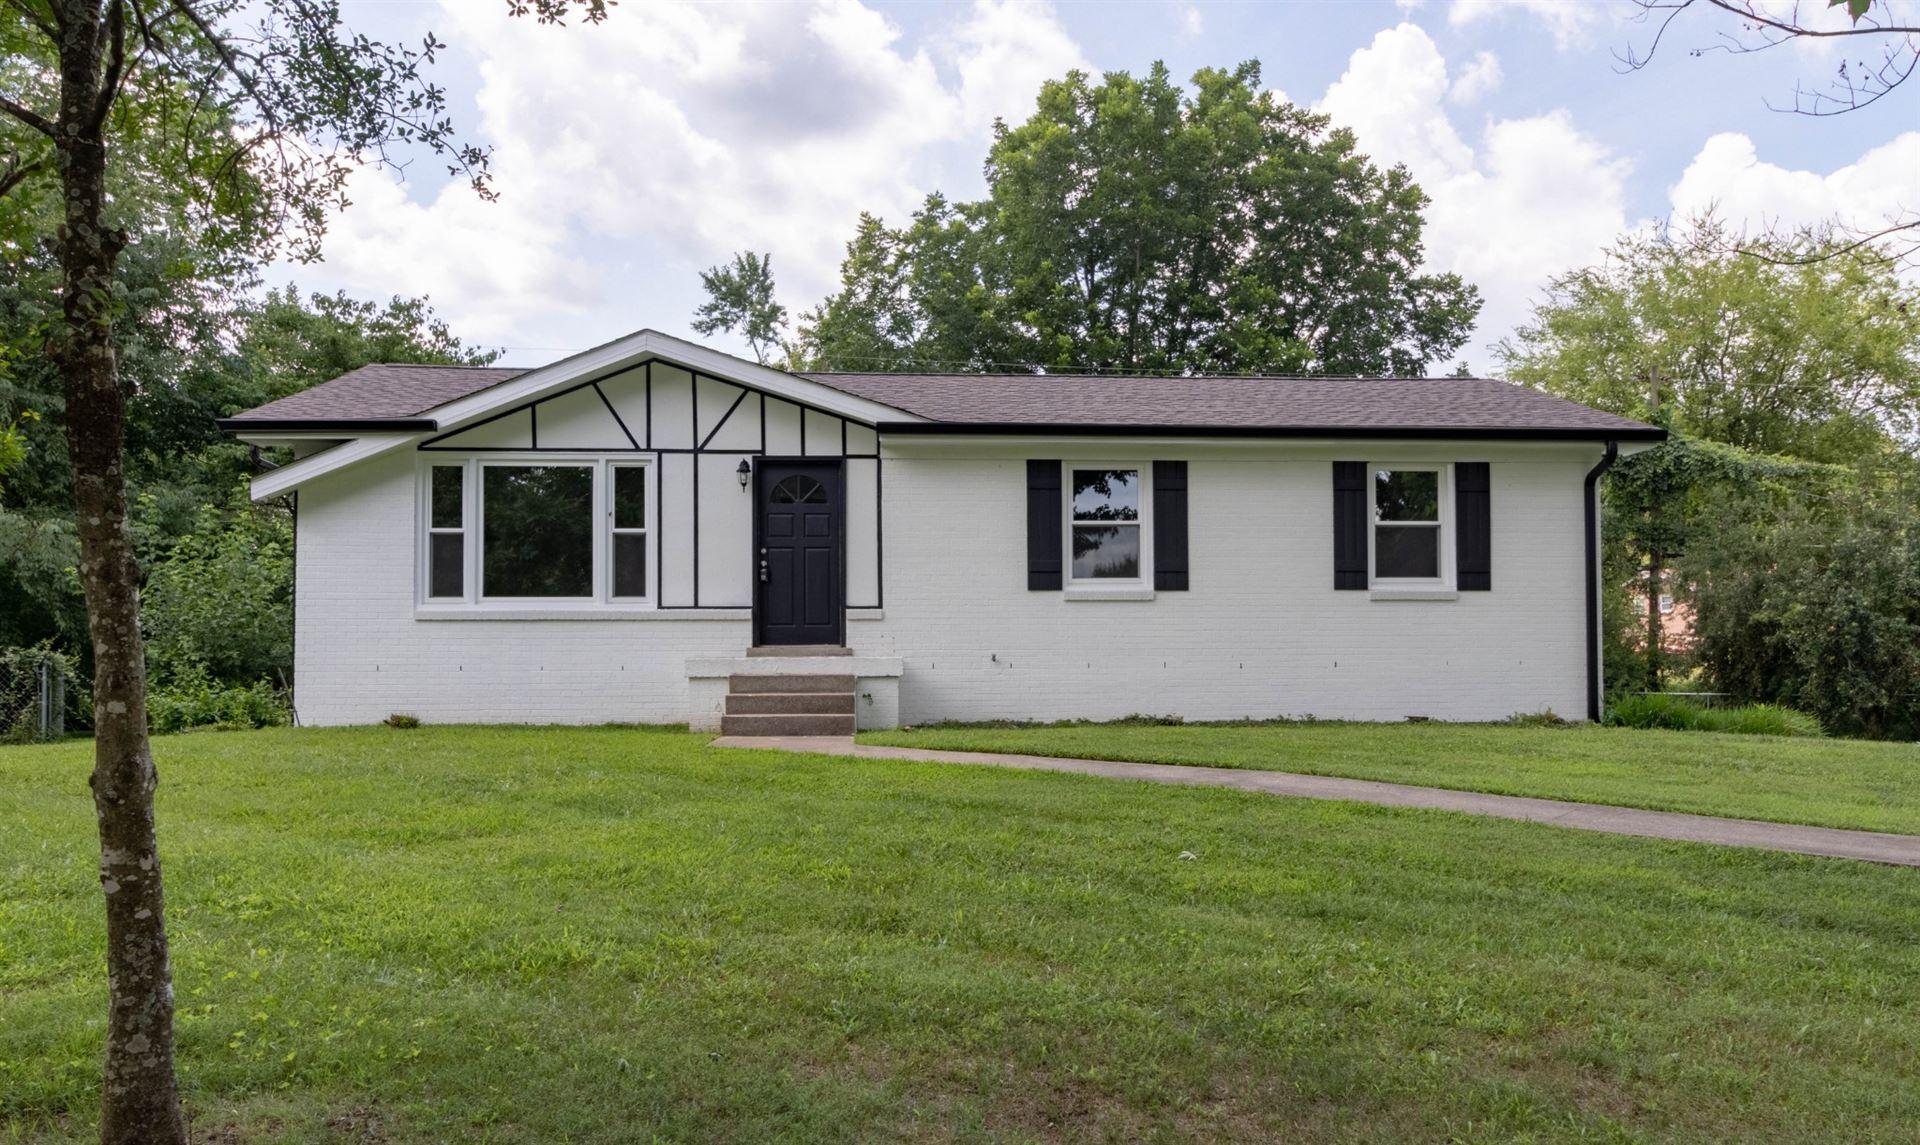 105 Love Ct, Clarksville, TN 37040 - MLS#: 2189291